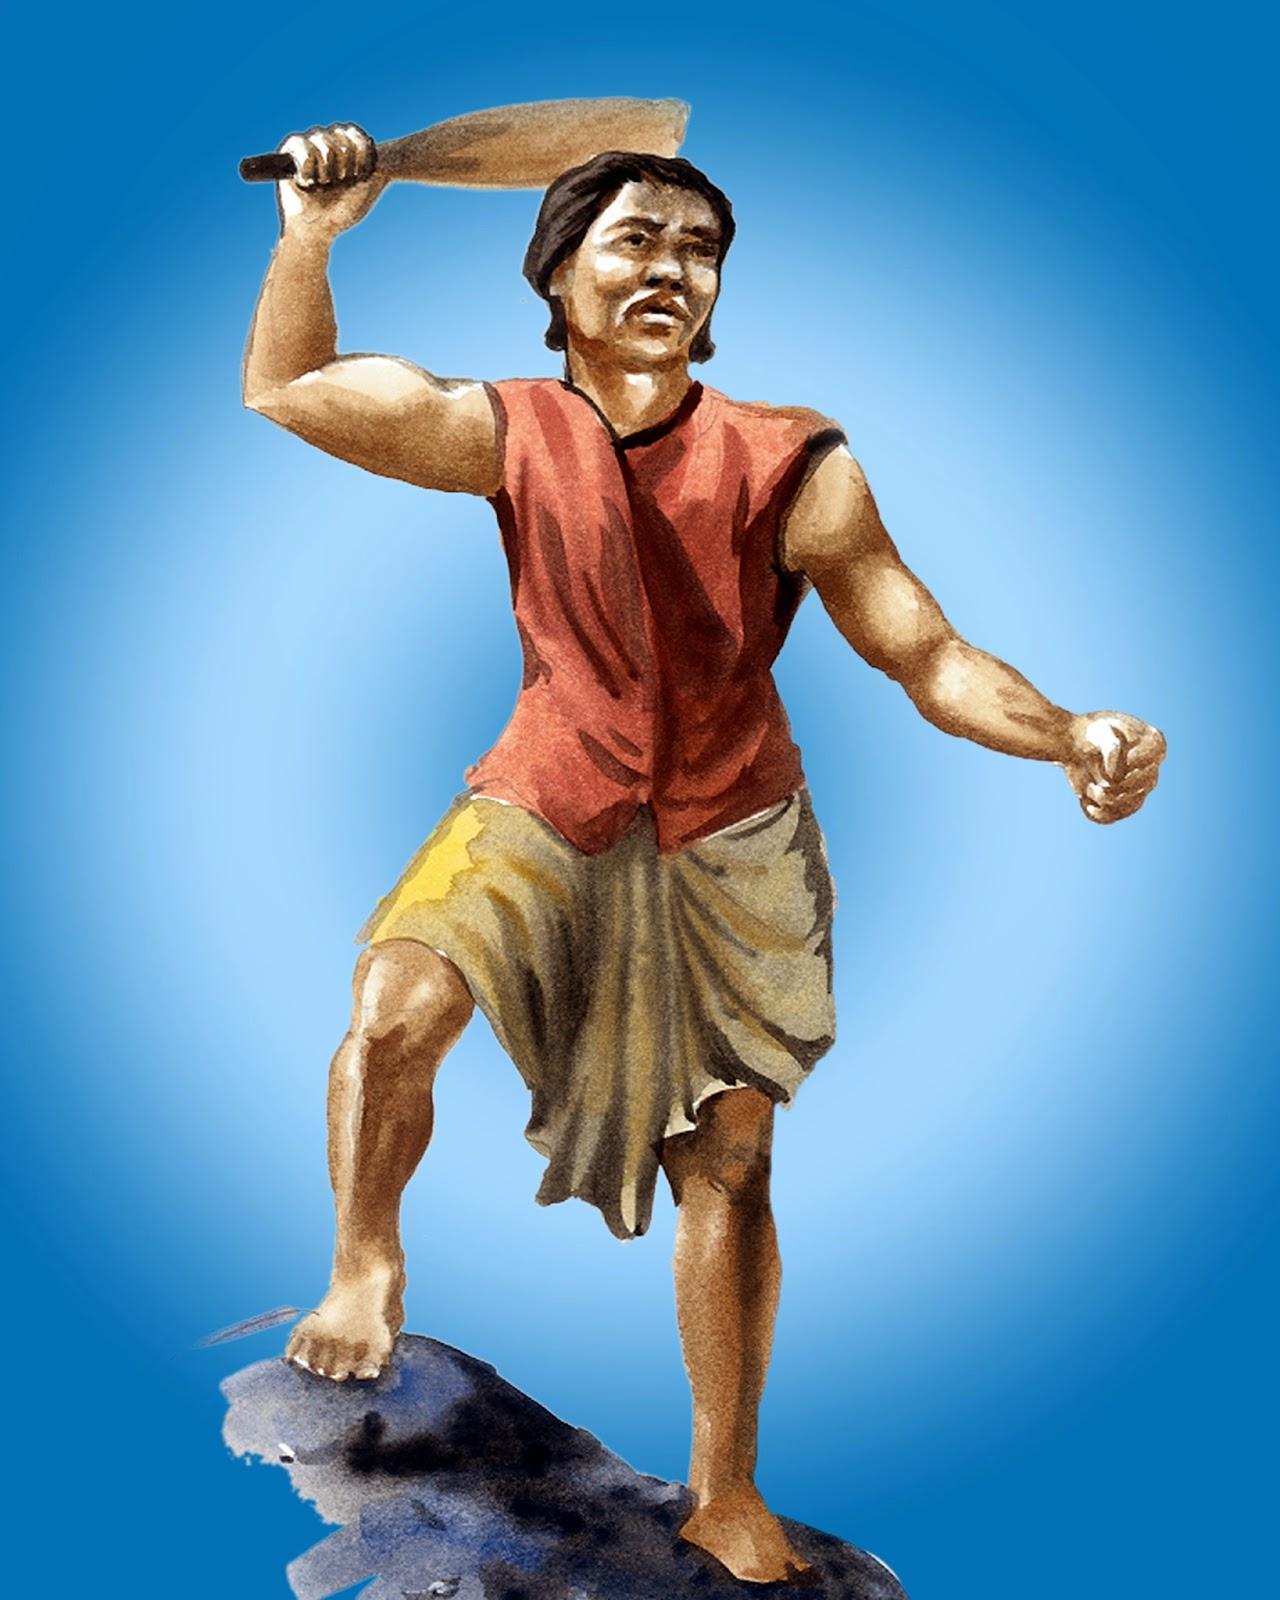 World watch shambhudhan phunglosa a freedom fighter from assam shambhudhan phunglosa a freedom fighter from assam altavistaventures Choice Image